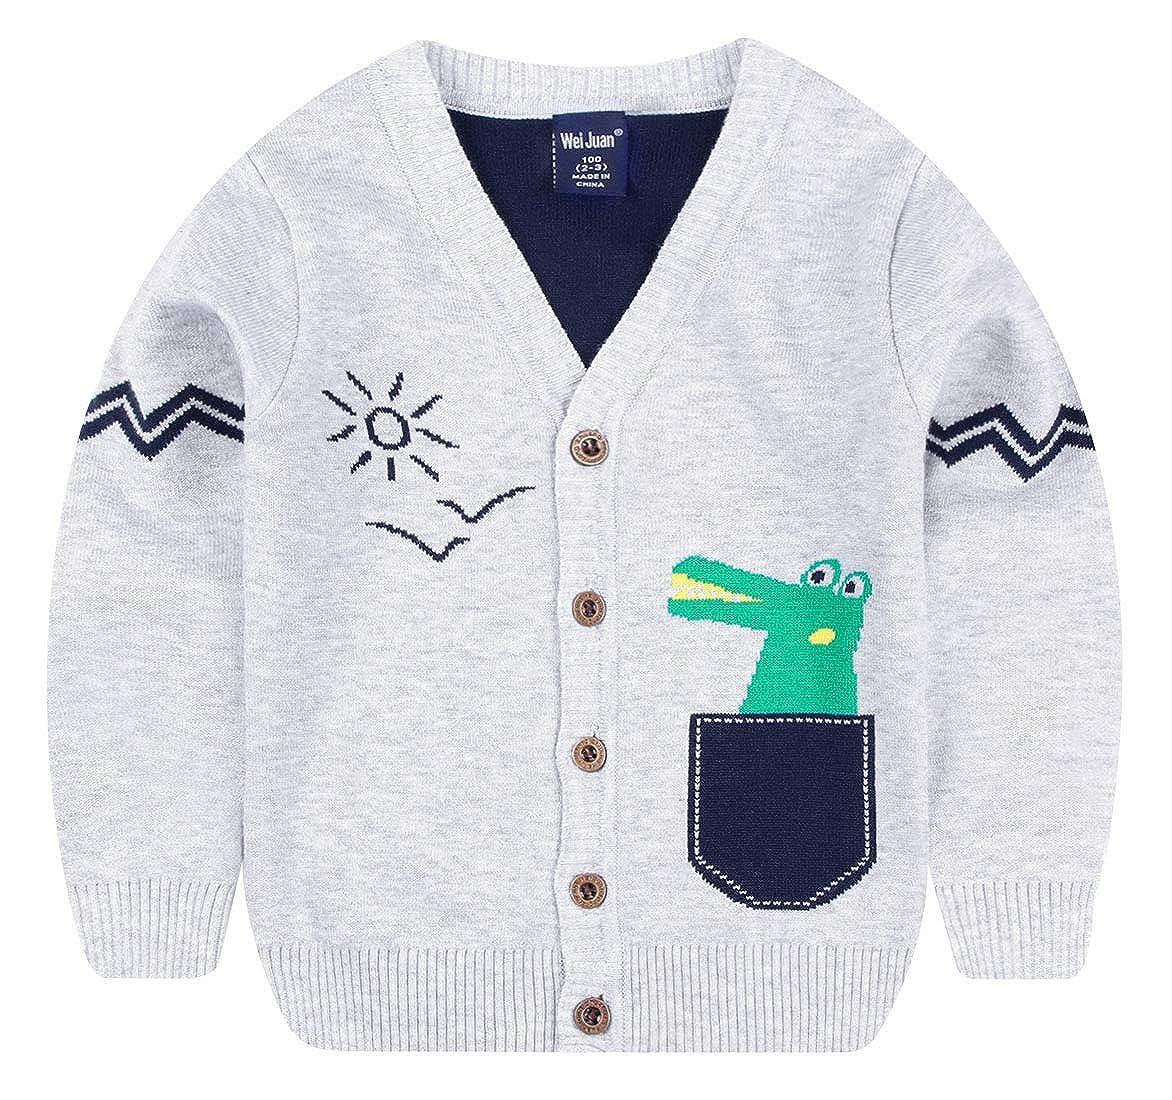 Weijuan Boys Sweater Cartoon Crocodile Long Sleeve Button Down Warm Cardigan 2-7T